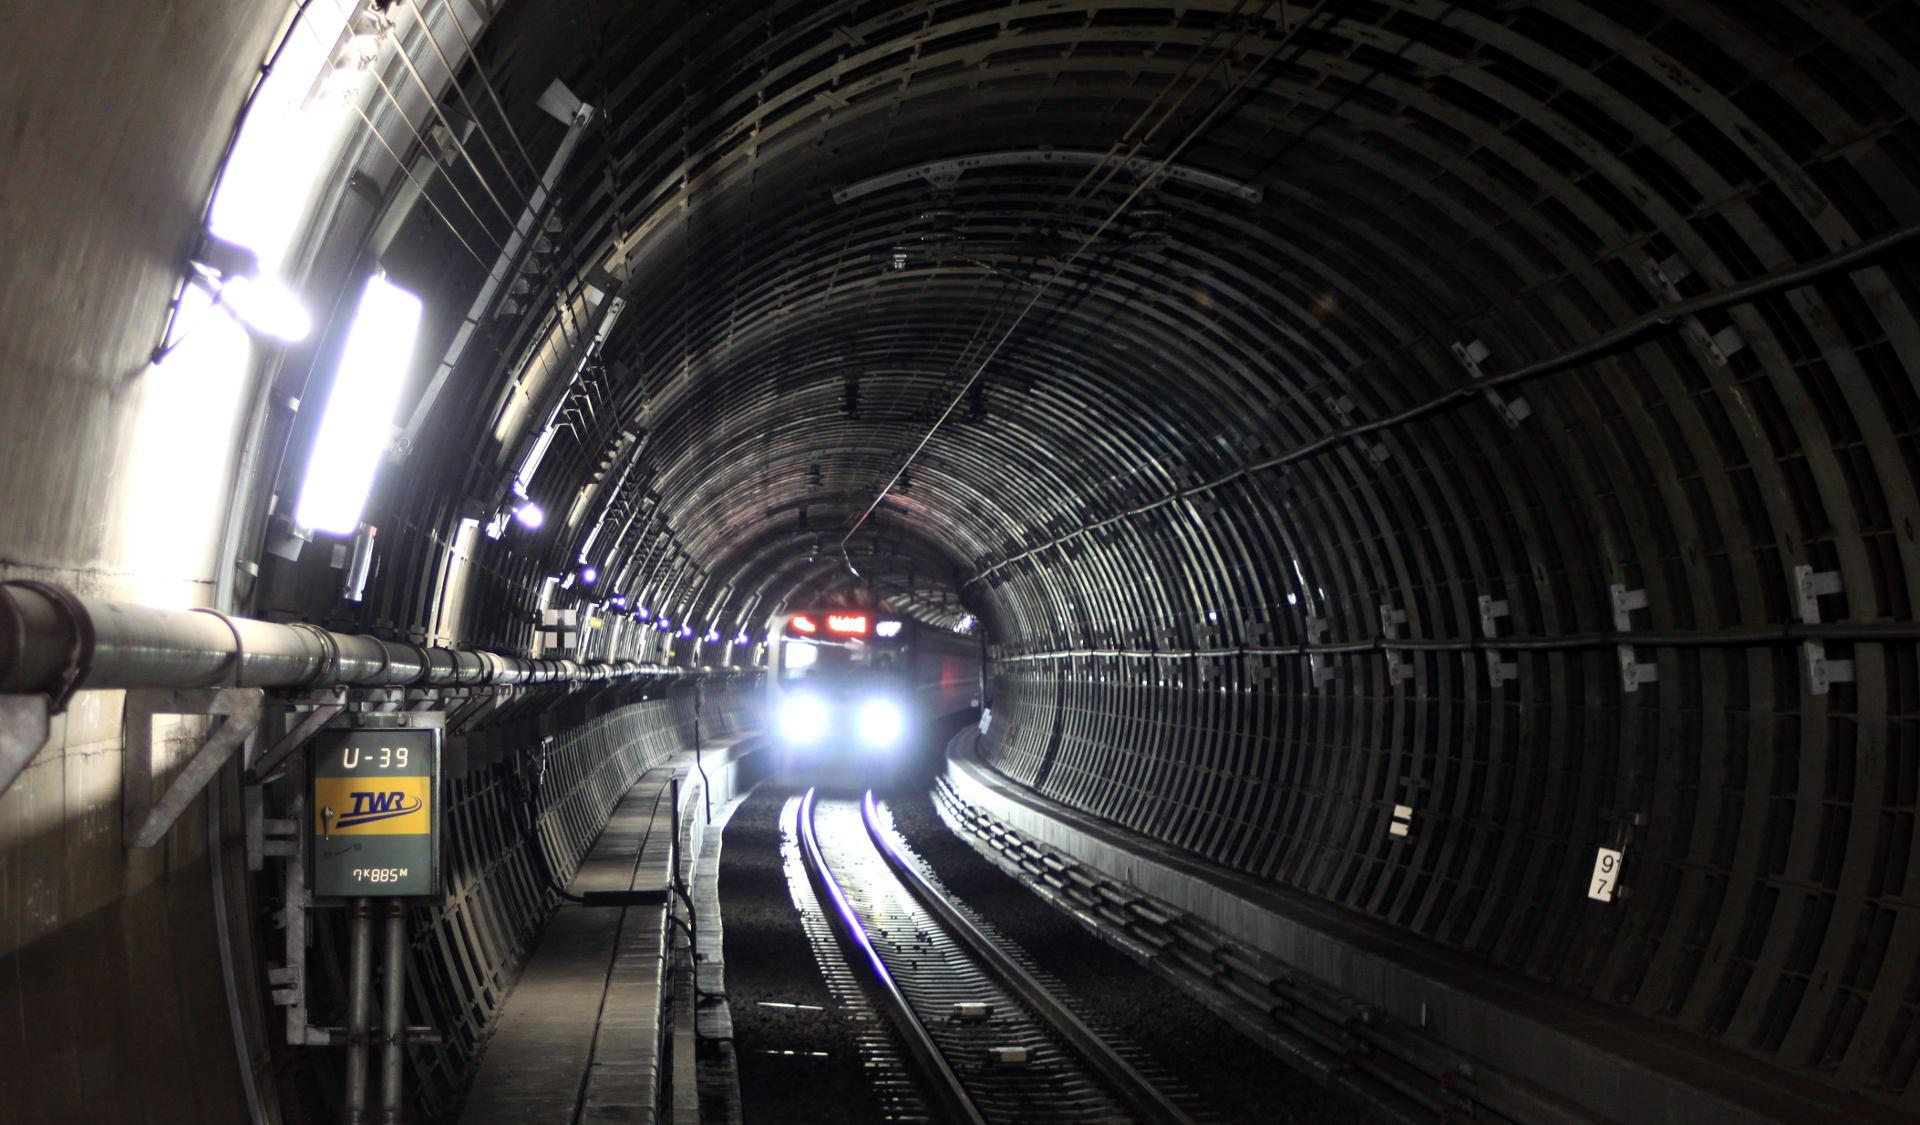 tokio japonia tokyo japan metrojaponskie metro iglawpodrozy